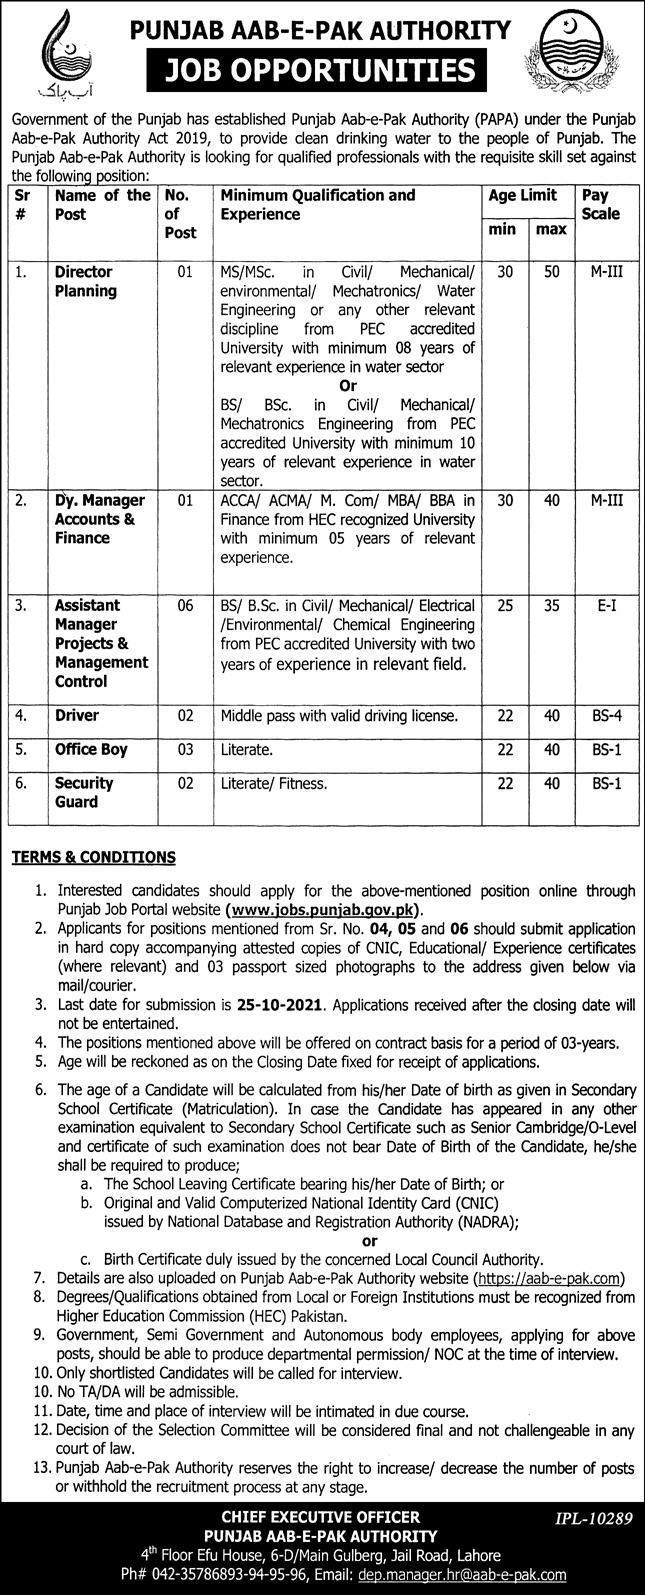 Latest Govt Jobs in Punjab 2021 Punjab Aab-E-Pak Authority